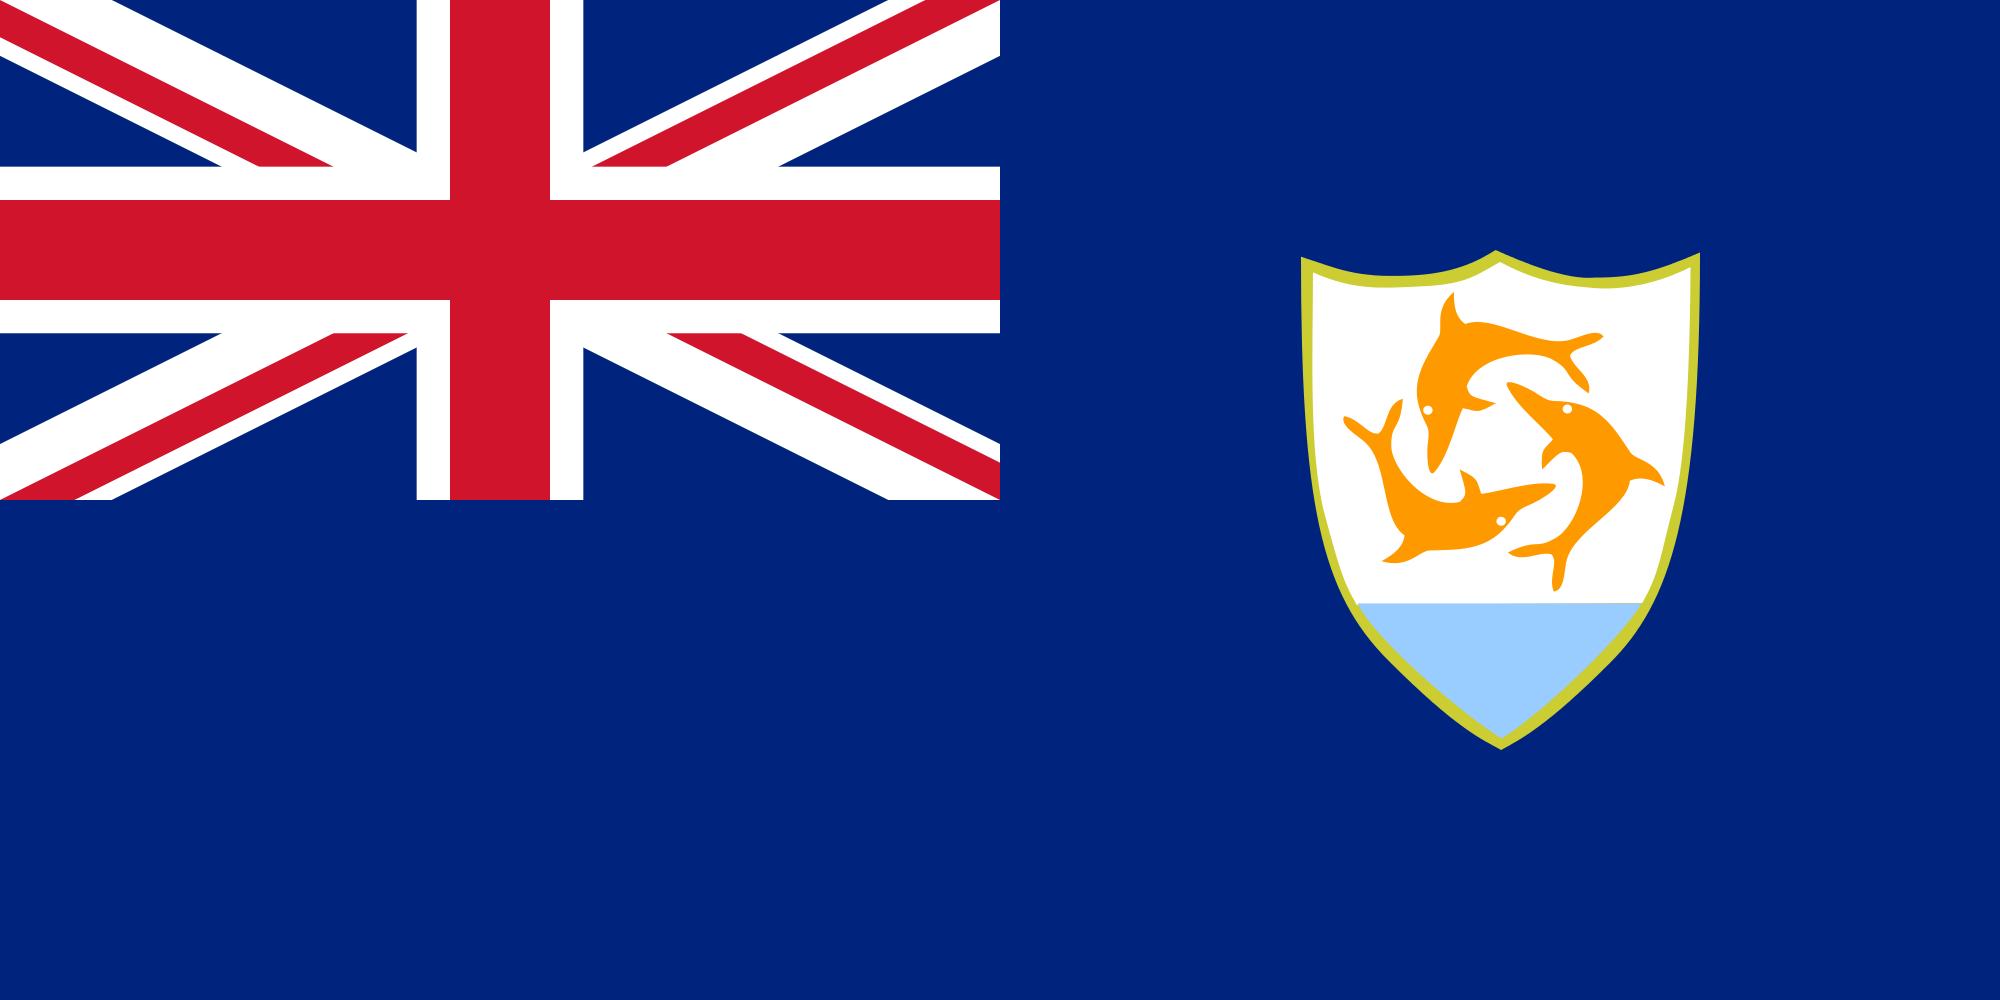 anguille, pays, emblème, logo, symbole - Fonds d'écran HD - Professor-falken.com